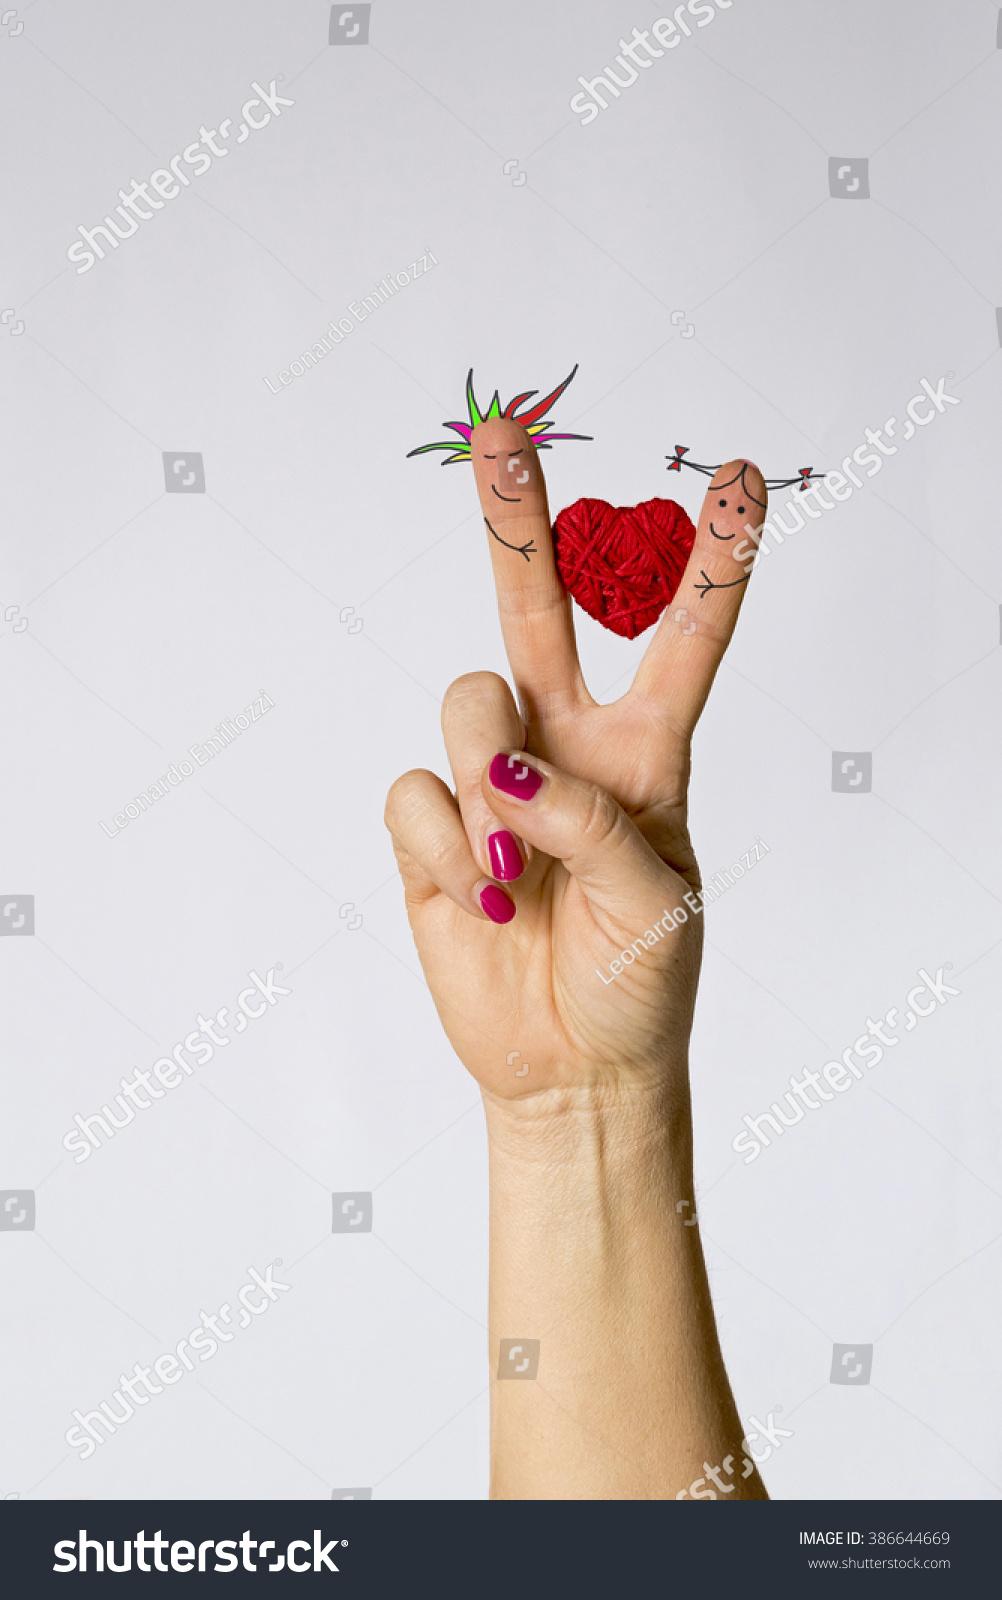 Symbol Loveheart Between Fingers Boy Girl Stock Photo 386644669 ...